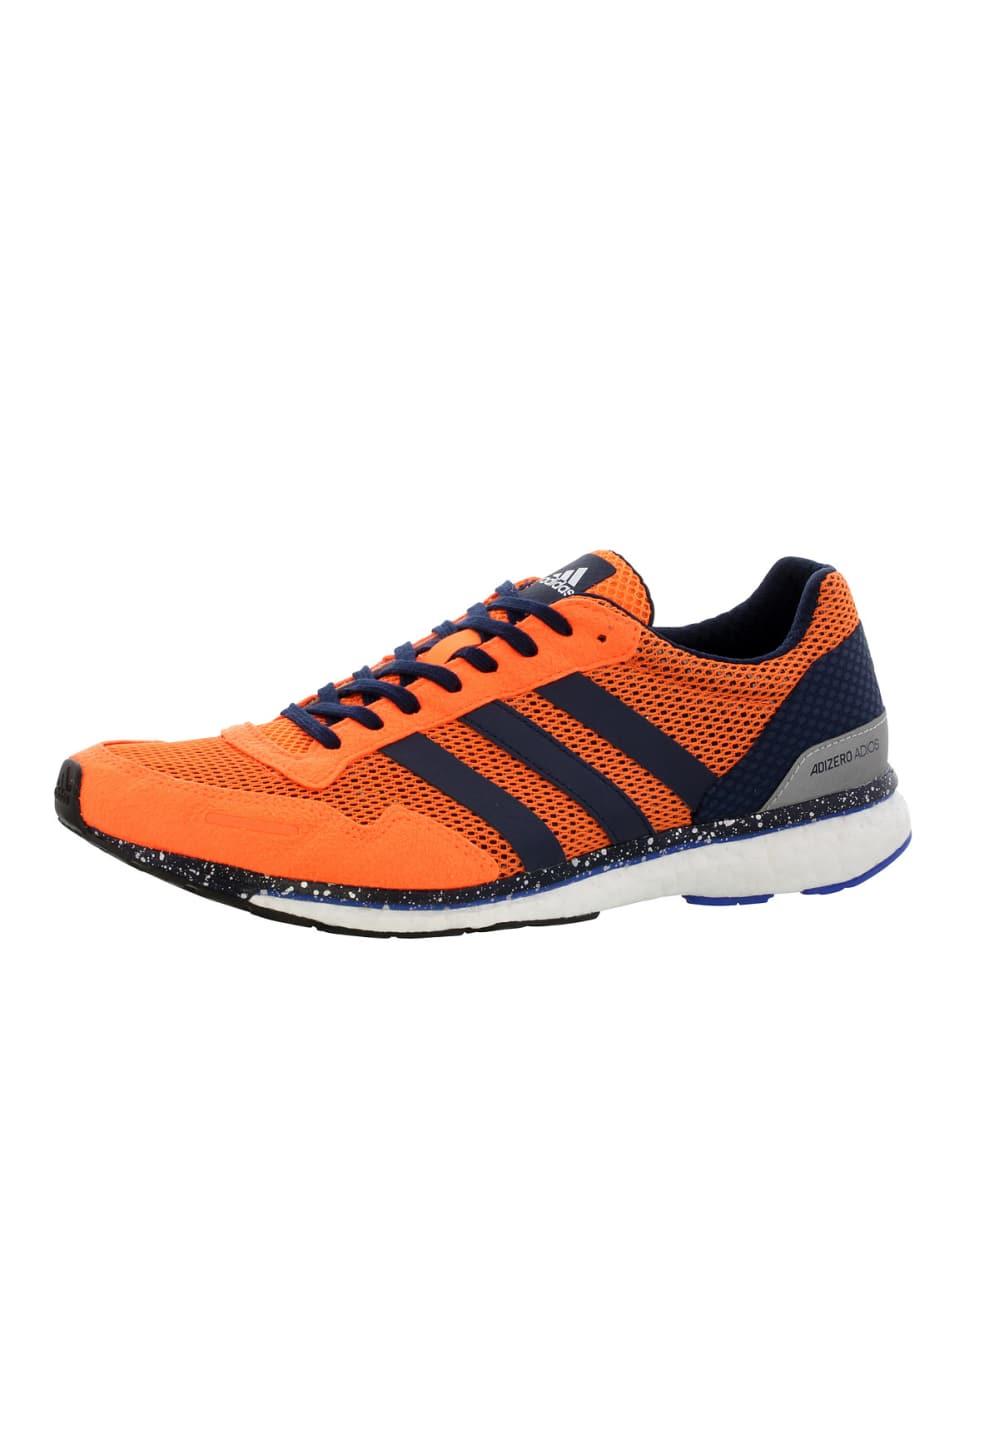 Adizero For Multicolor Men Running Adidas Adios Shoes 9WDEH2I